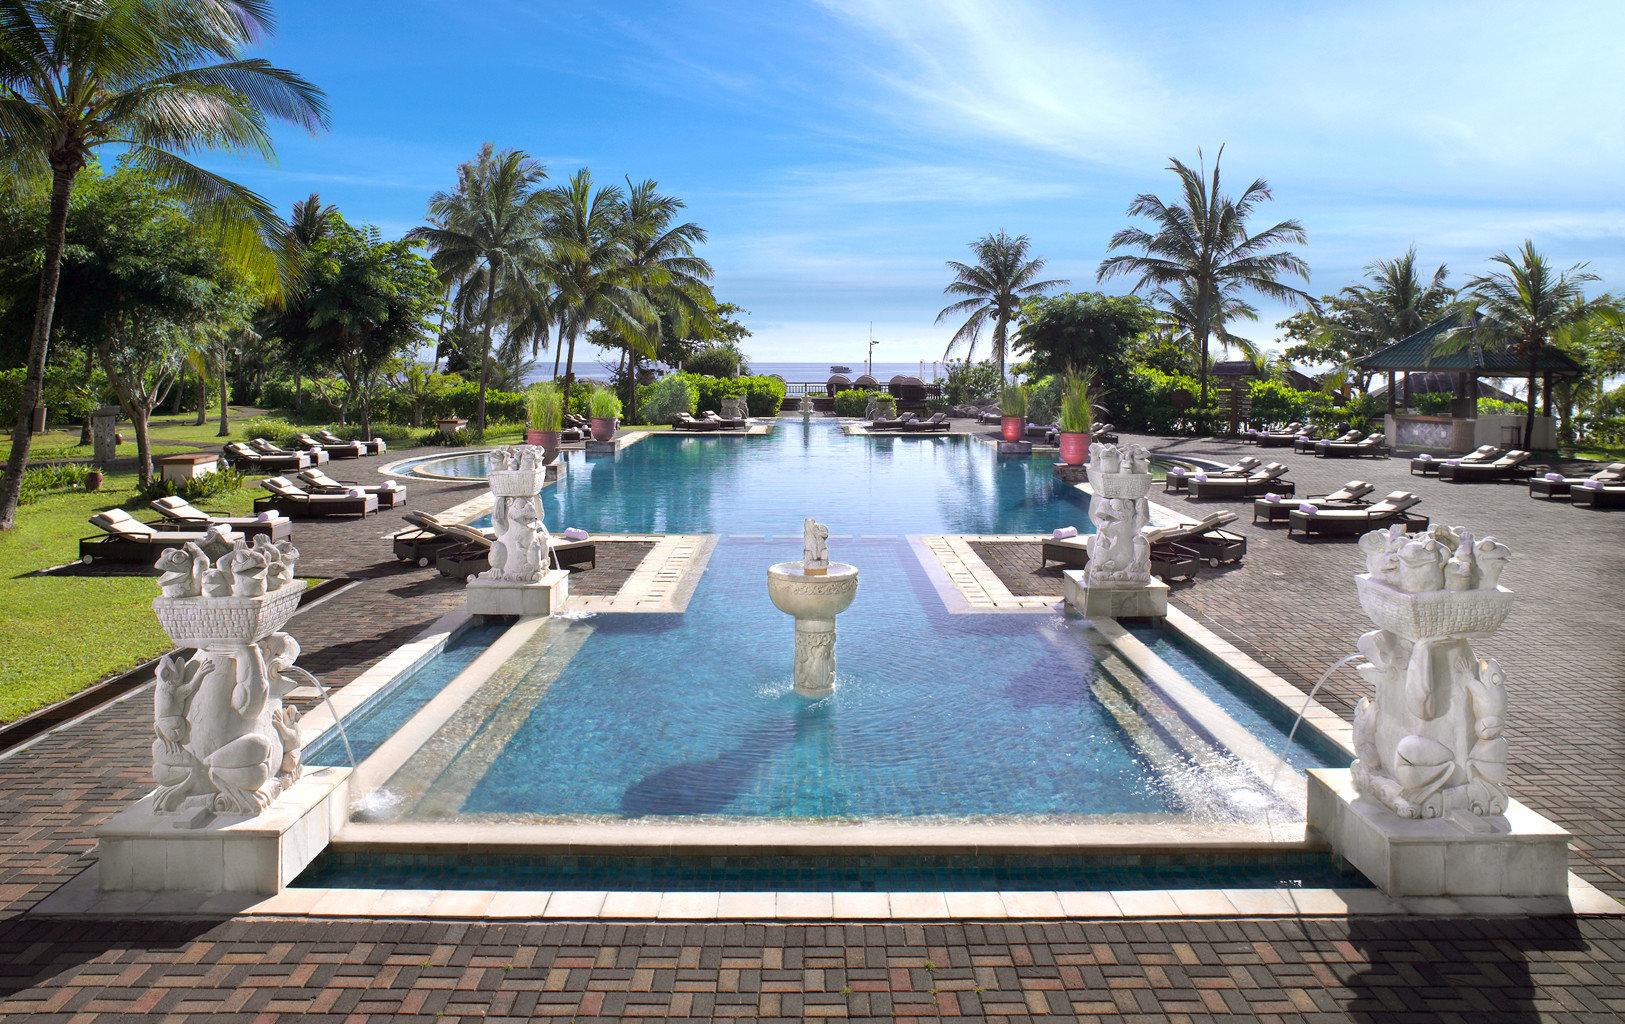 Elegant Lounge Luxury Pool tree sky swimming pool leisure Resort property reflecting pool resort town Villa palace condominium set palm